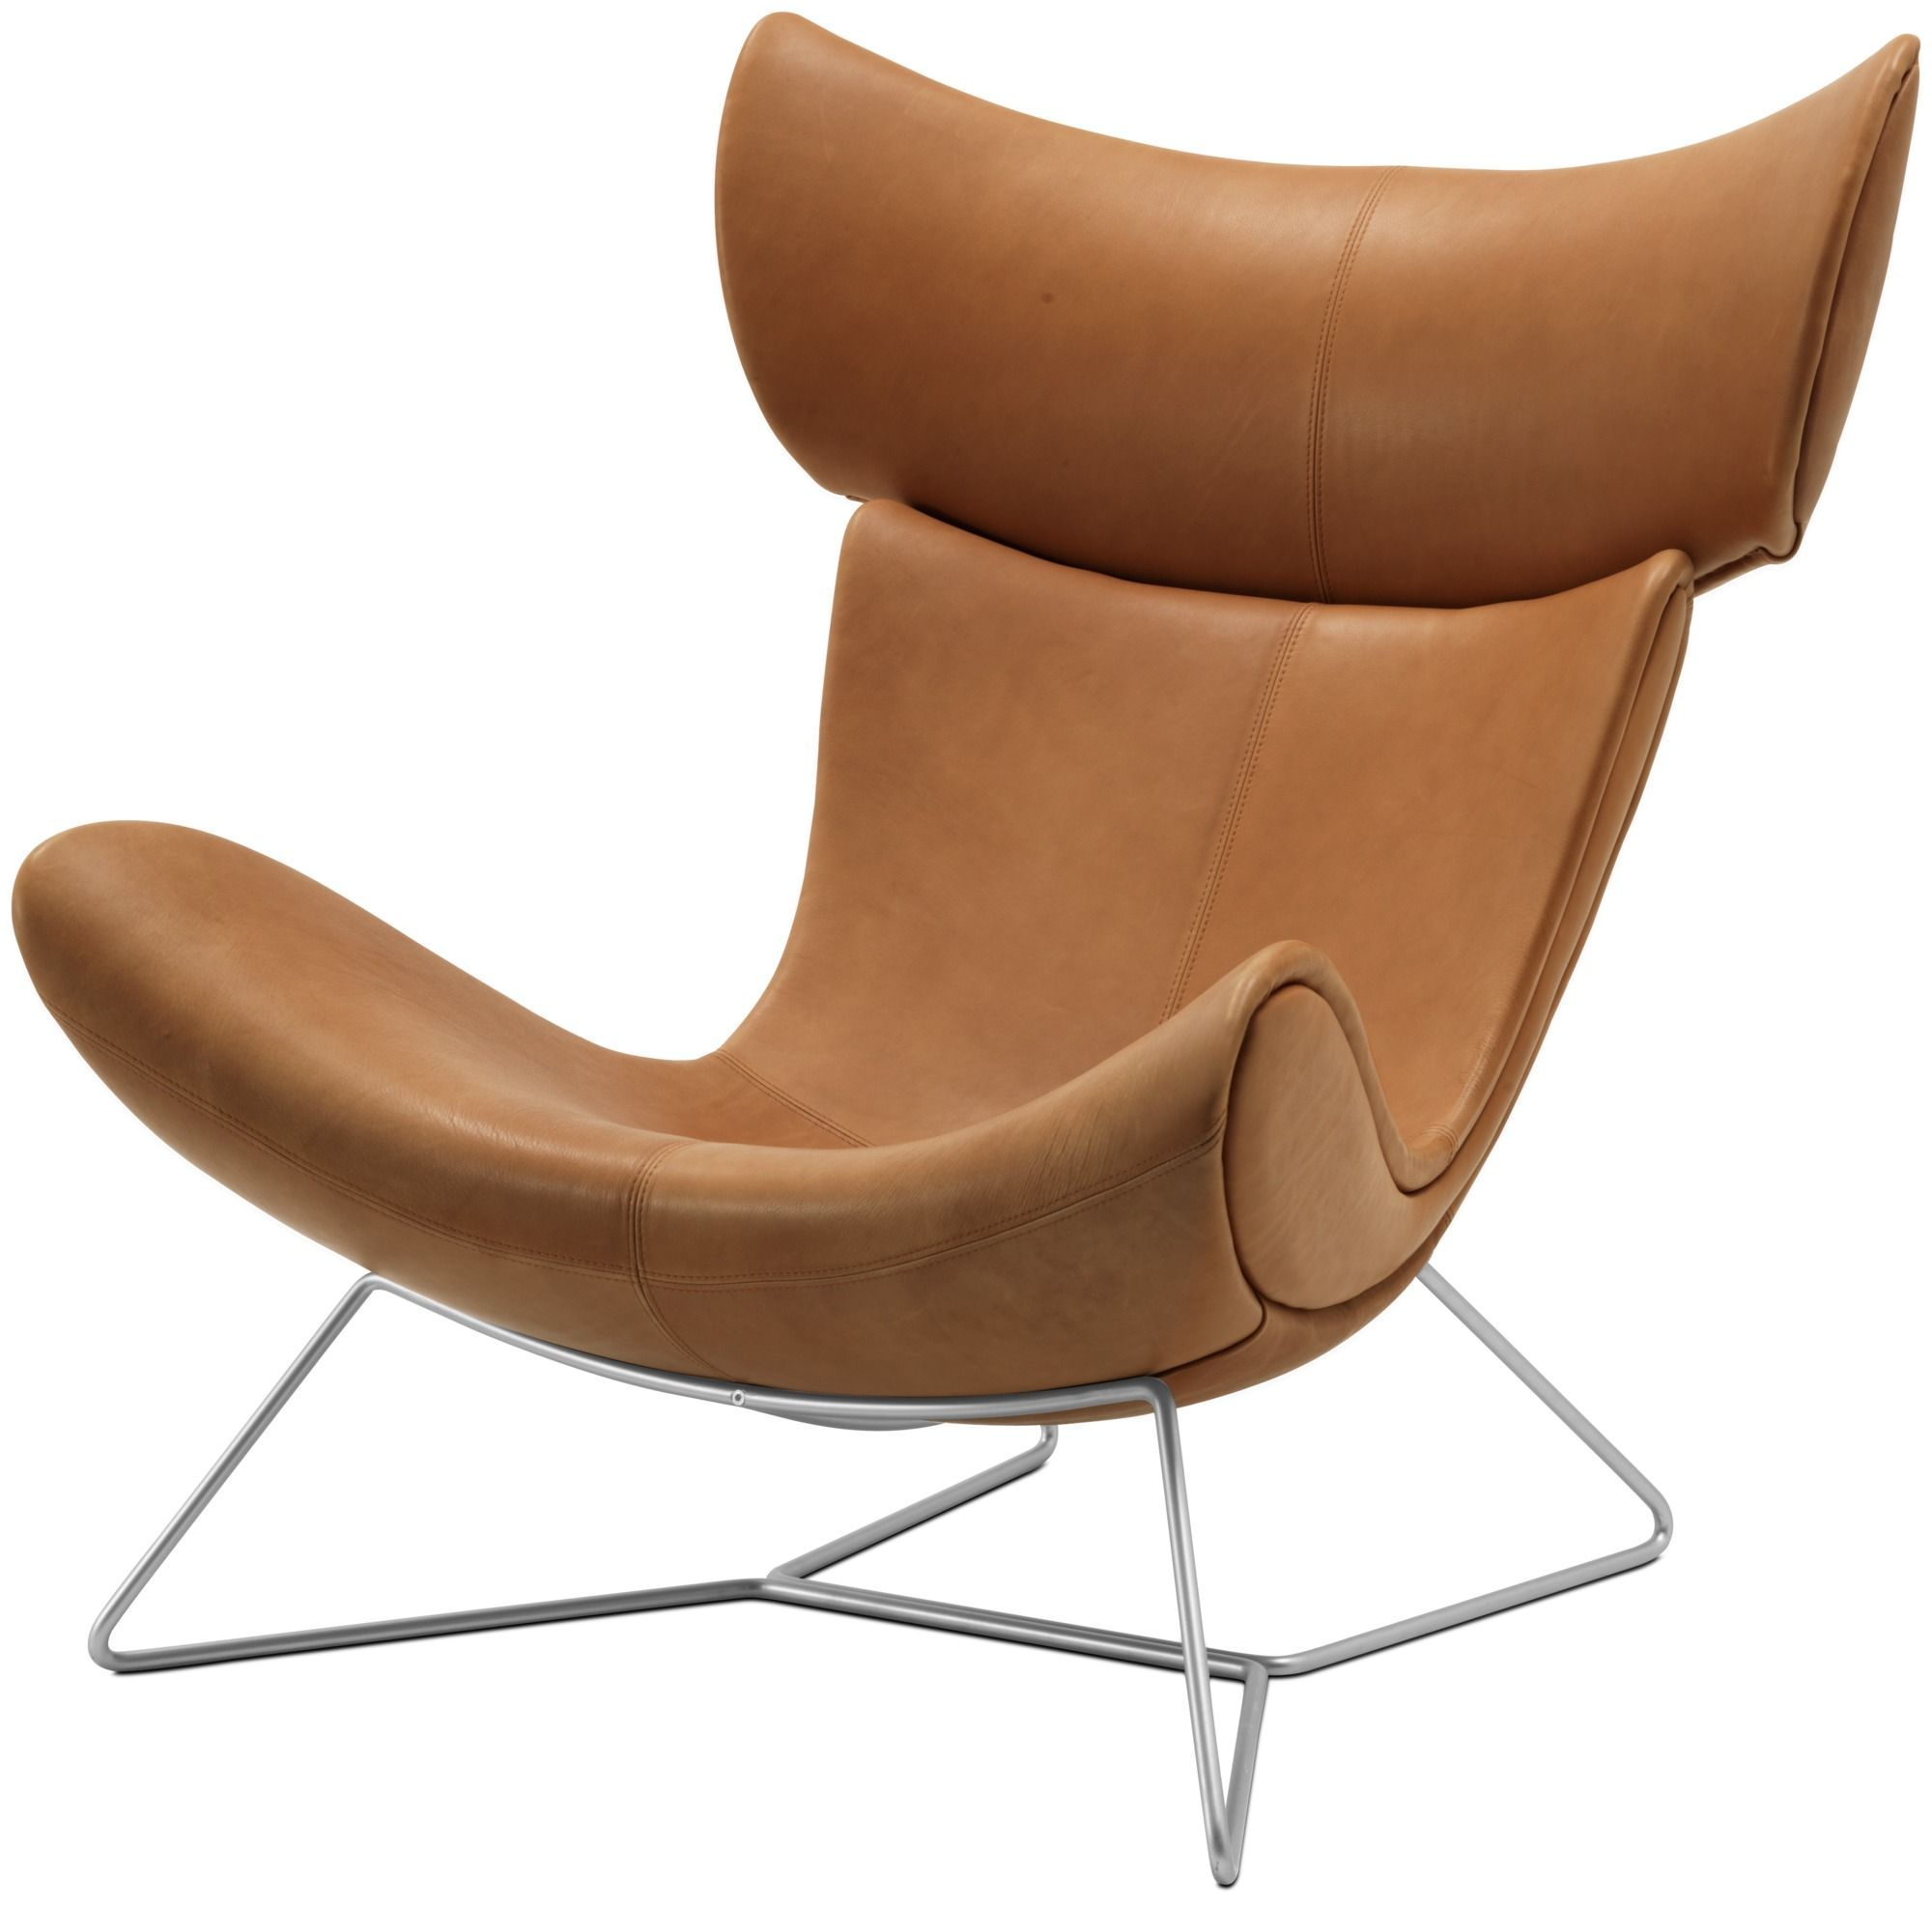 Captivating Modern Armchairs   Contemporary Armchairs   BoConcept Design Henrik  Pedersen Imola Chair, Available In Fabrics